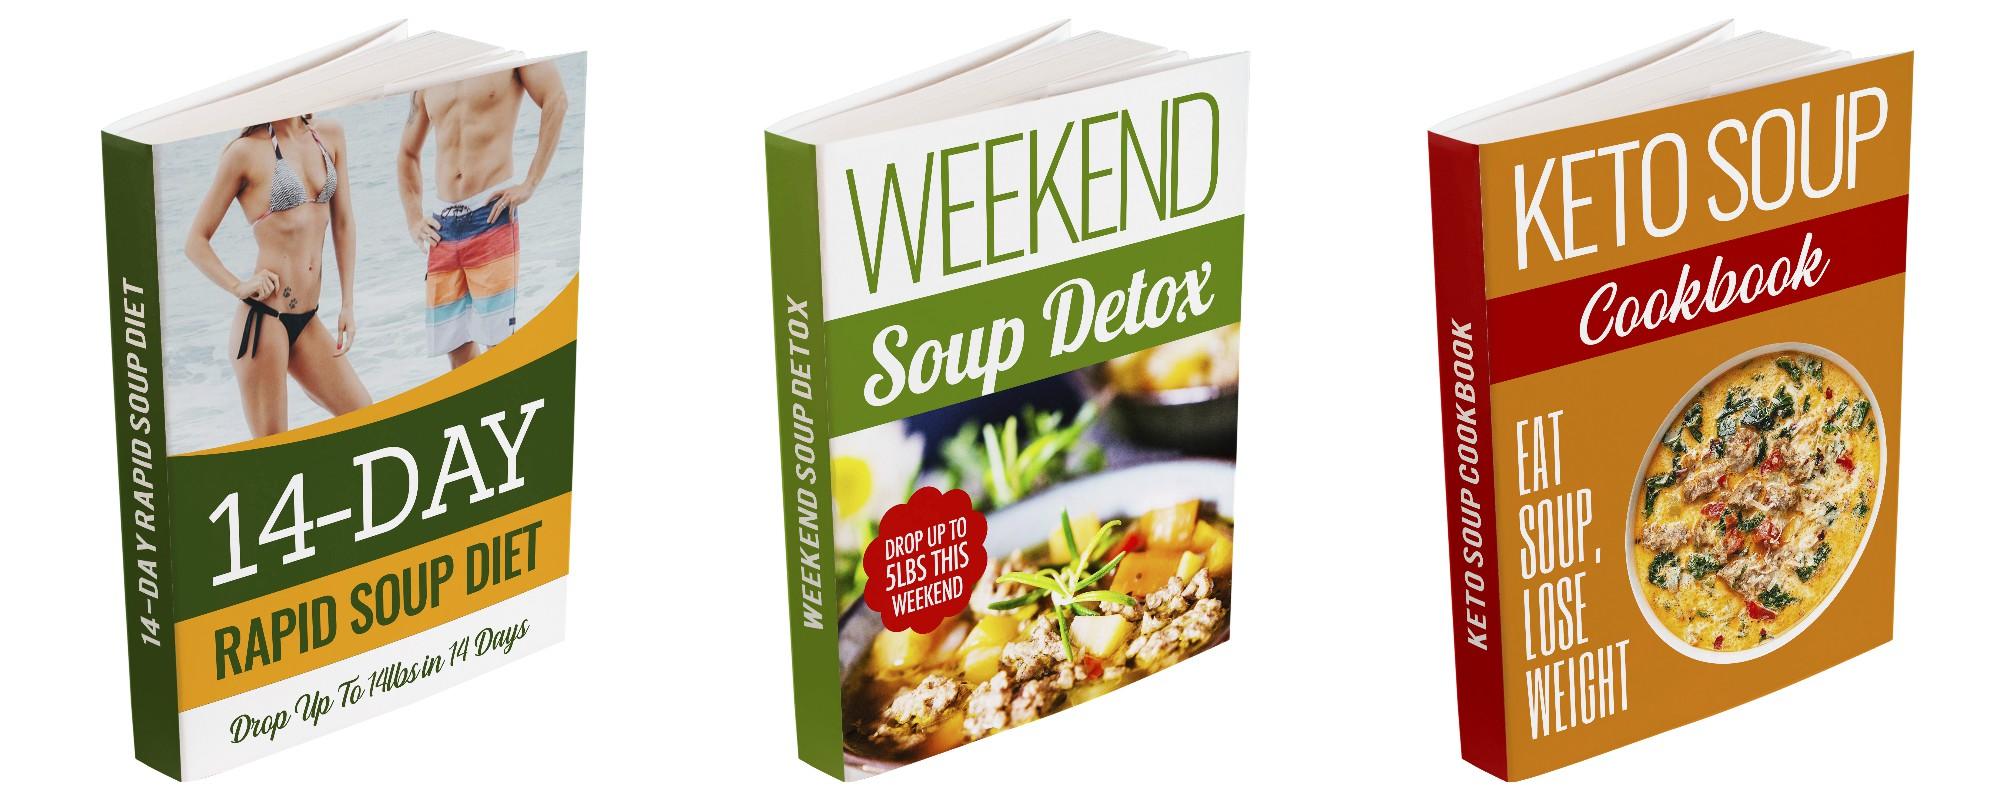 weekend soup detox